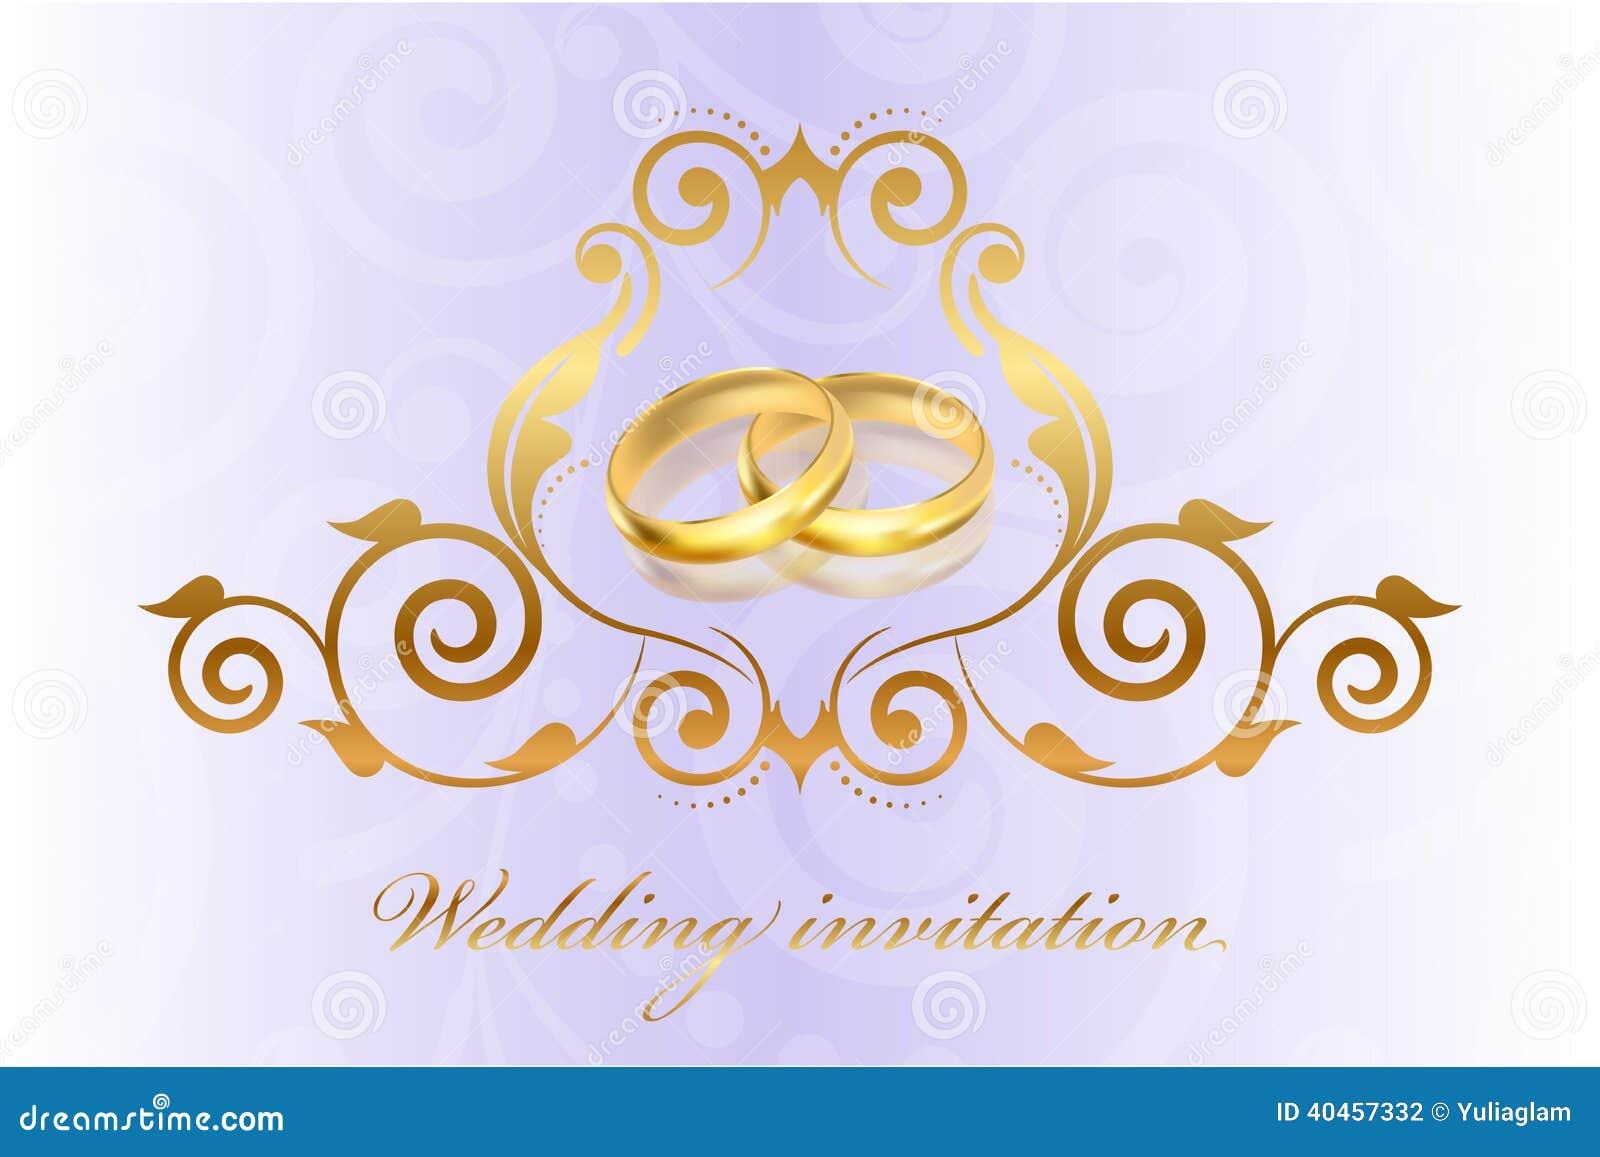 wedding proposal ornament